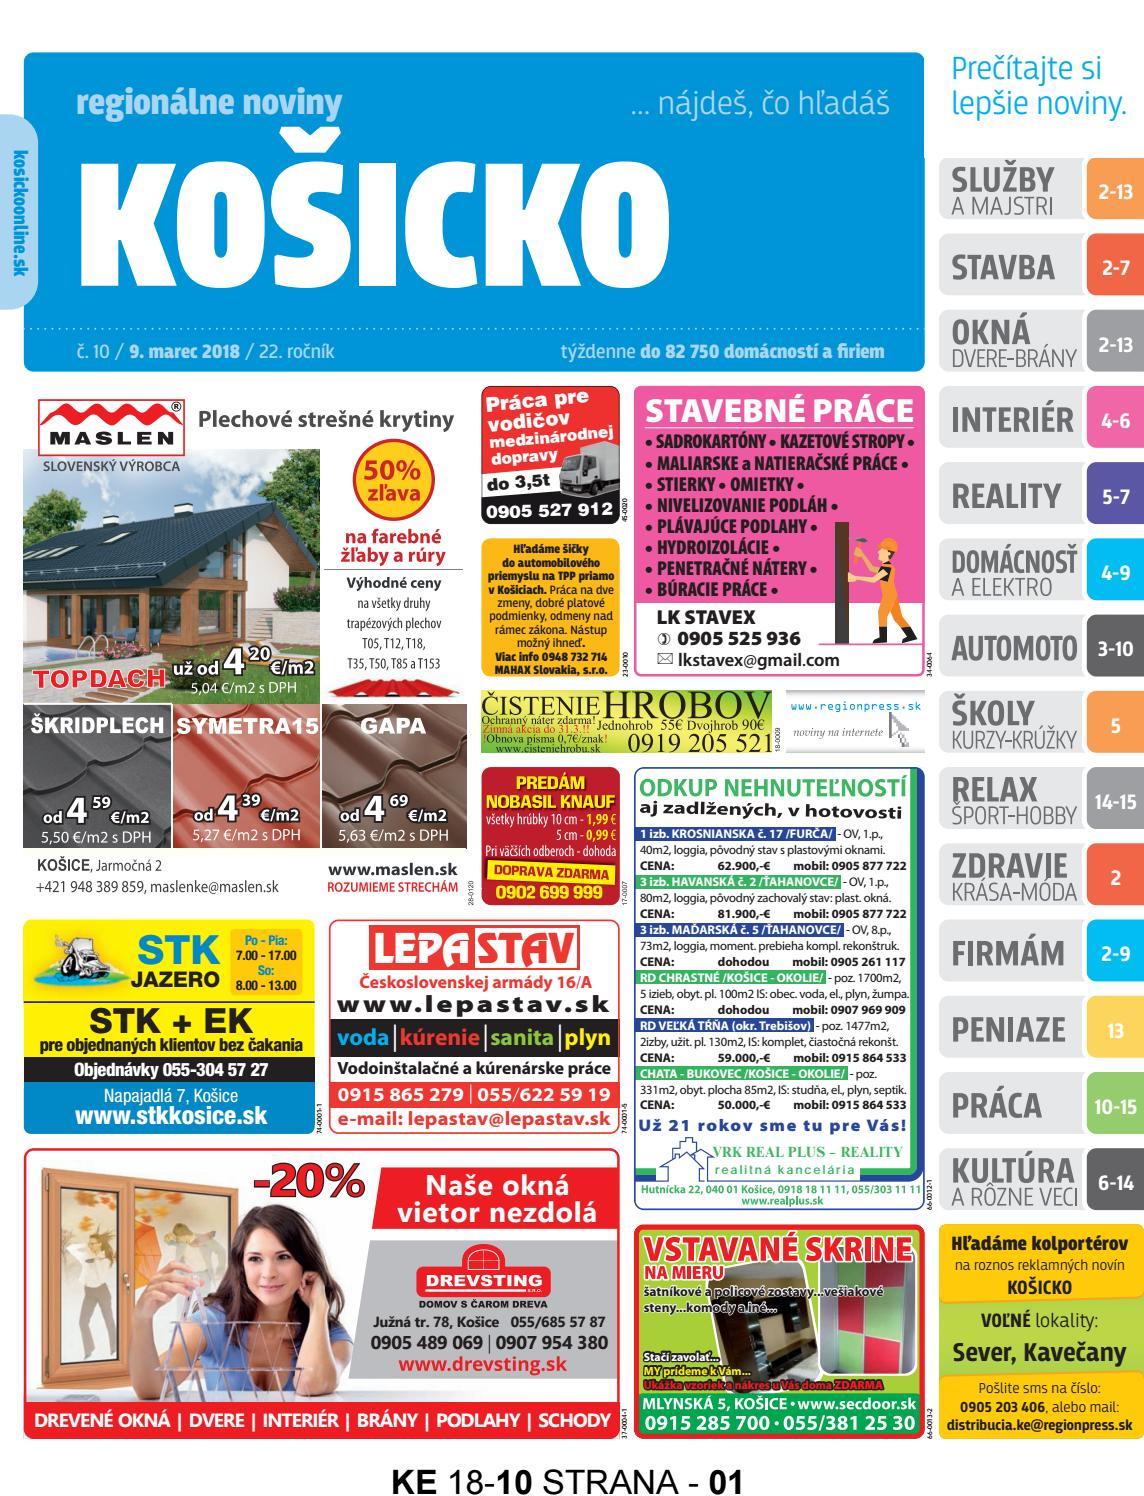 Intro Online Zoznamka e-mail